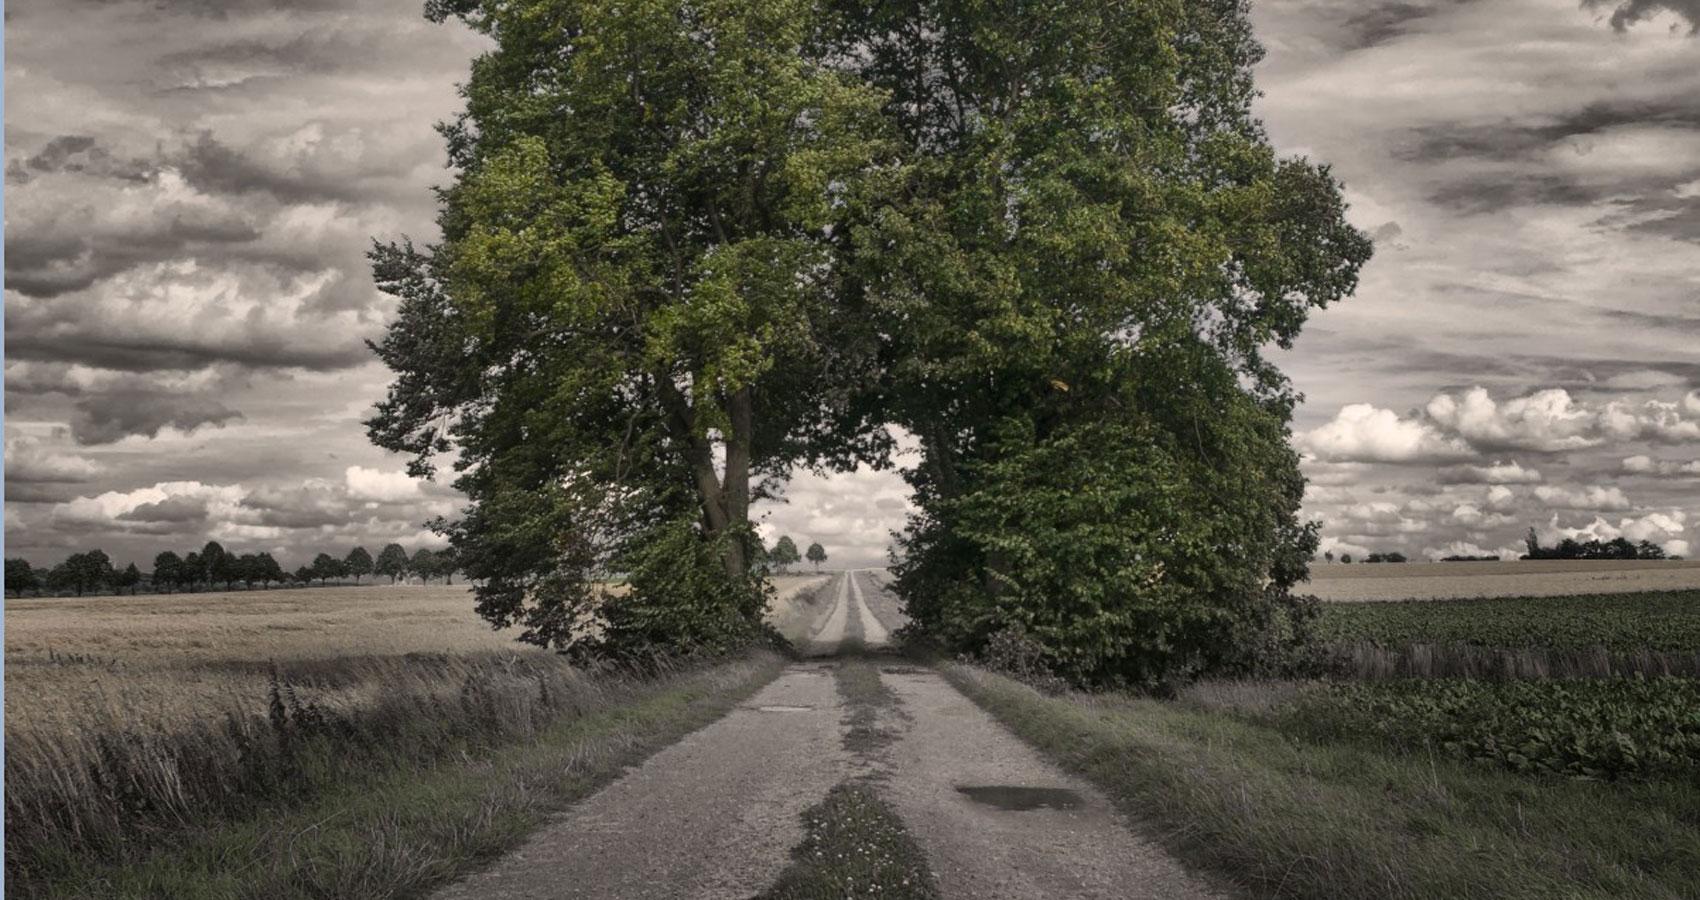 The Long Road, written by Fallen Engel at Spillwords.com